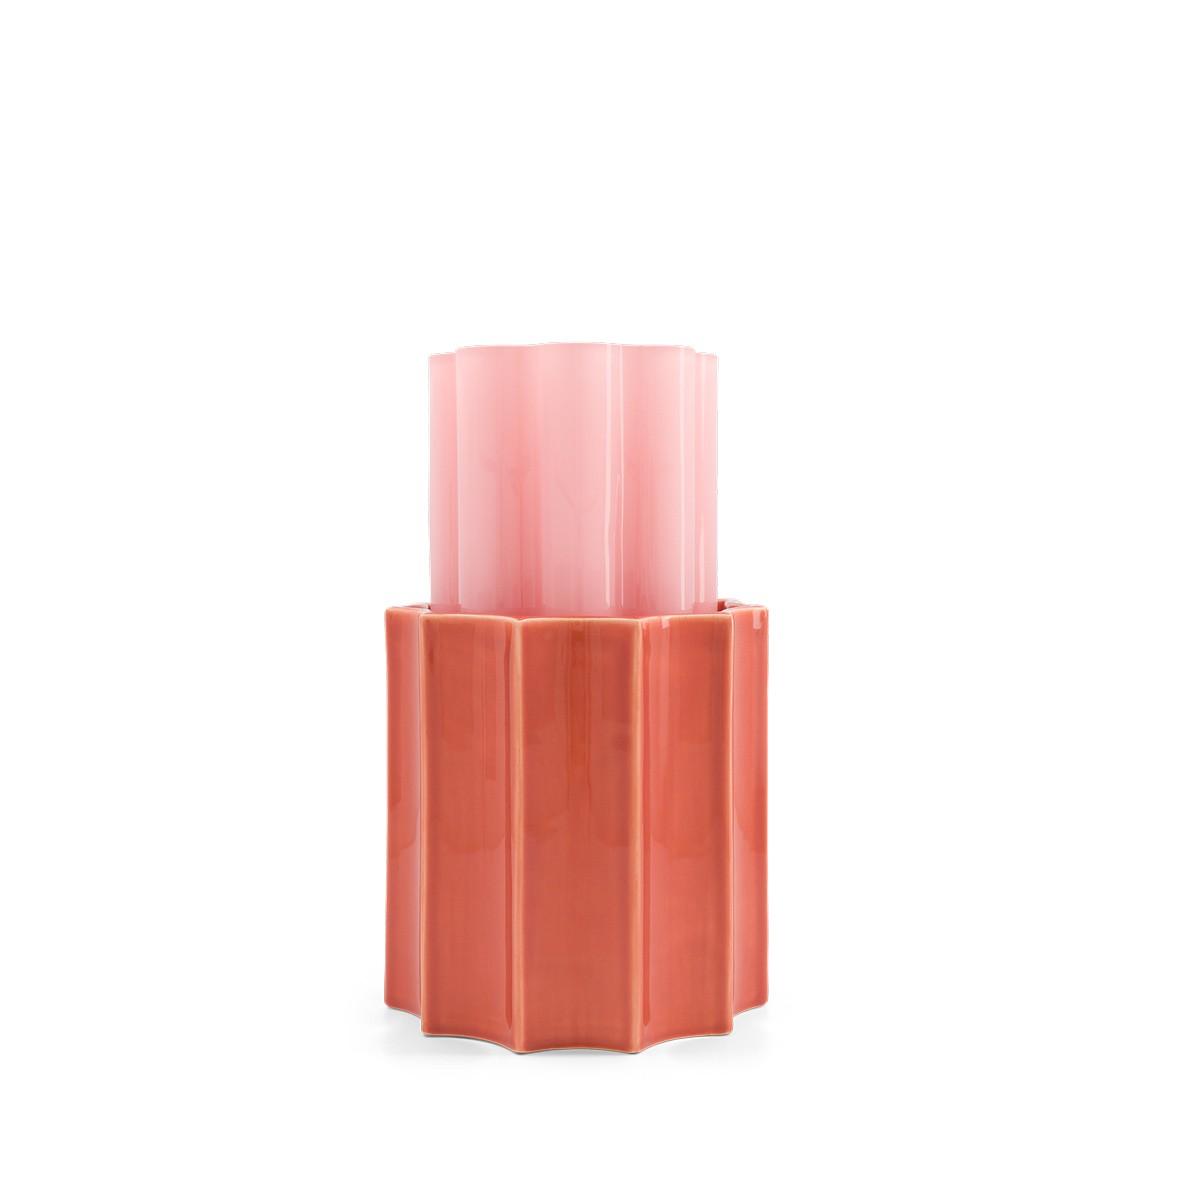 Vase Duetto rose bonbon et terracotta